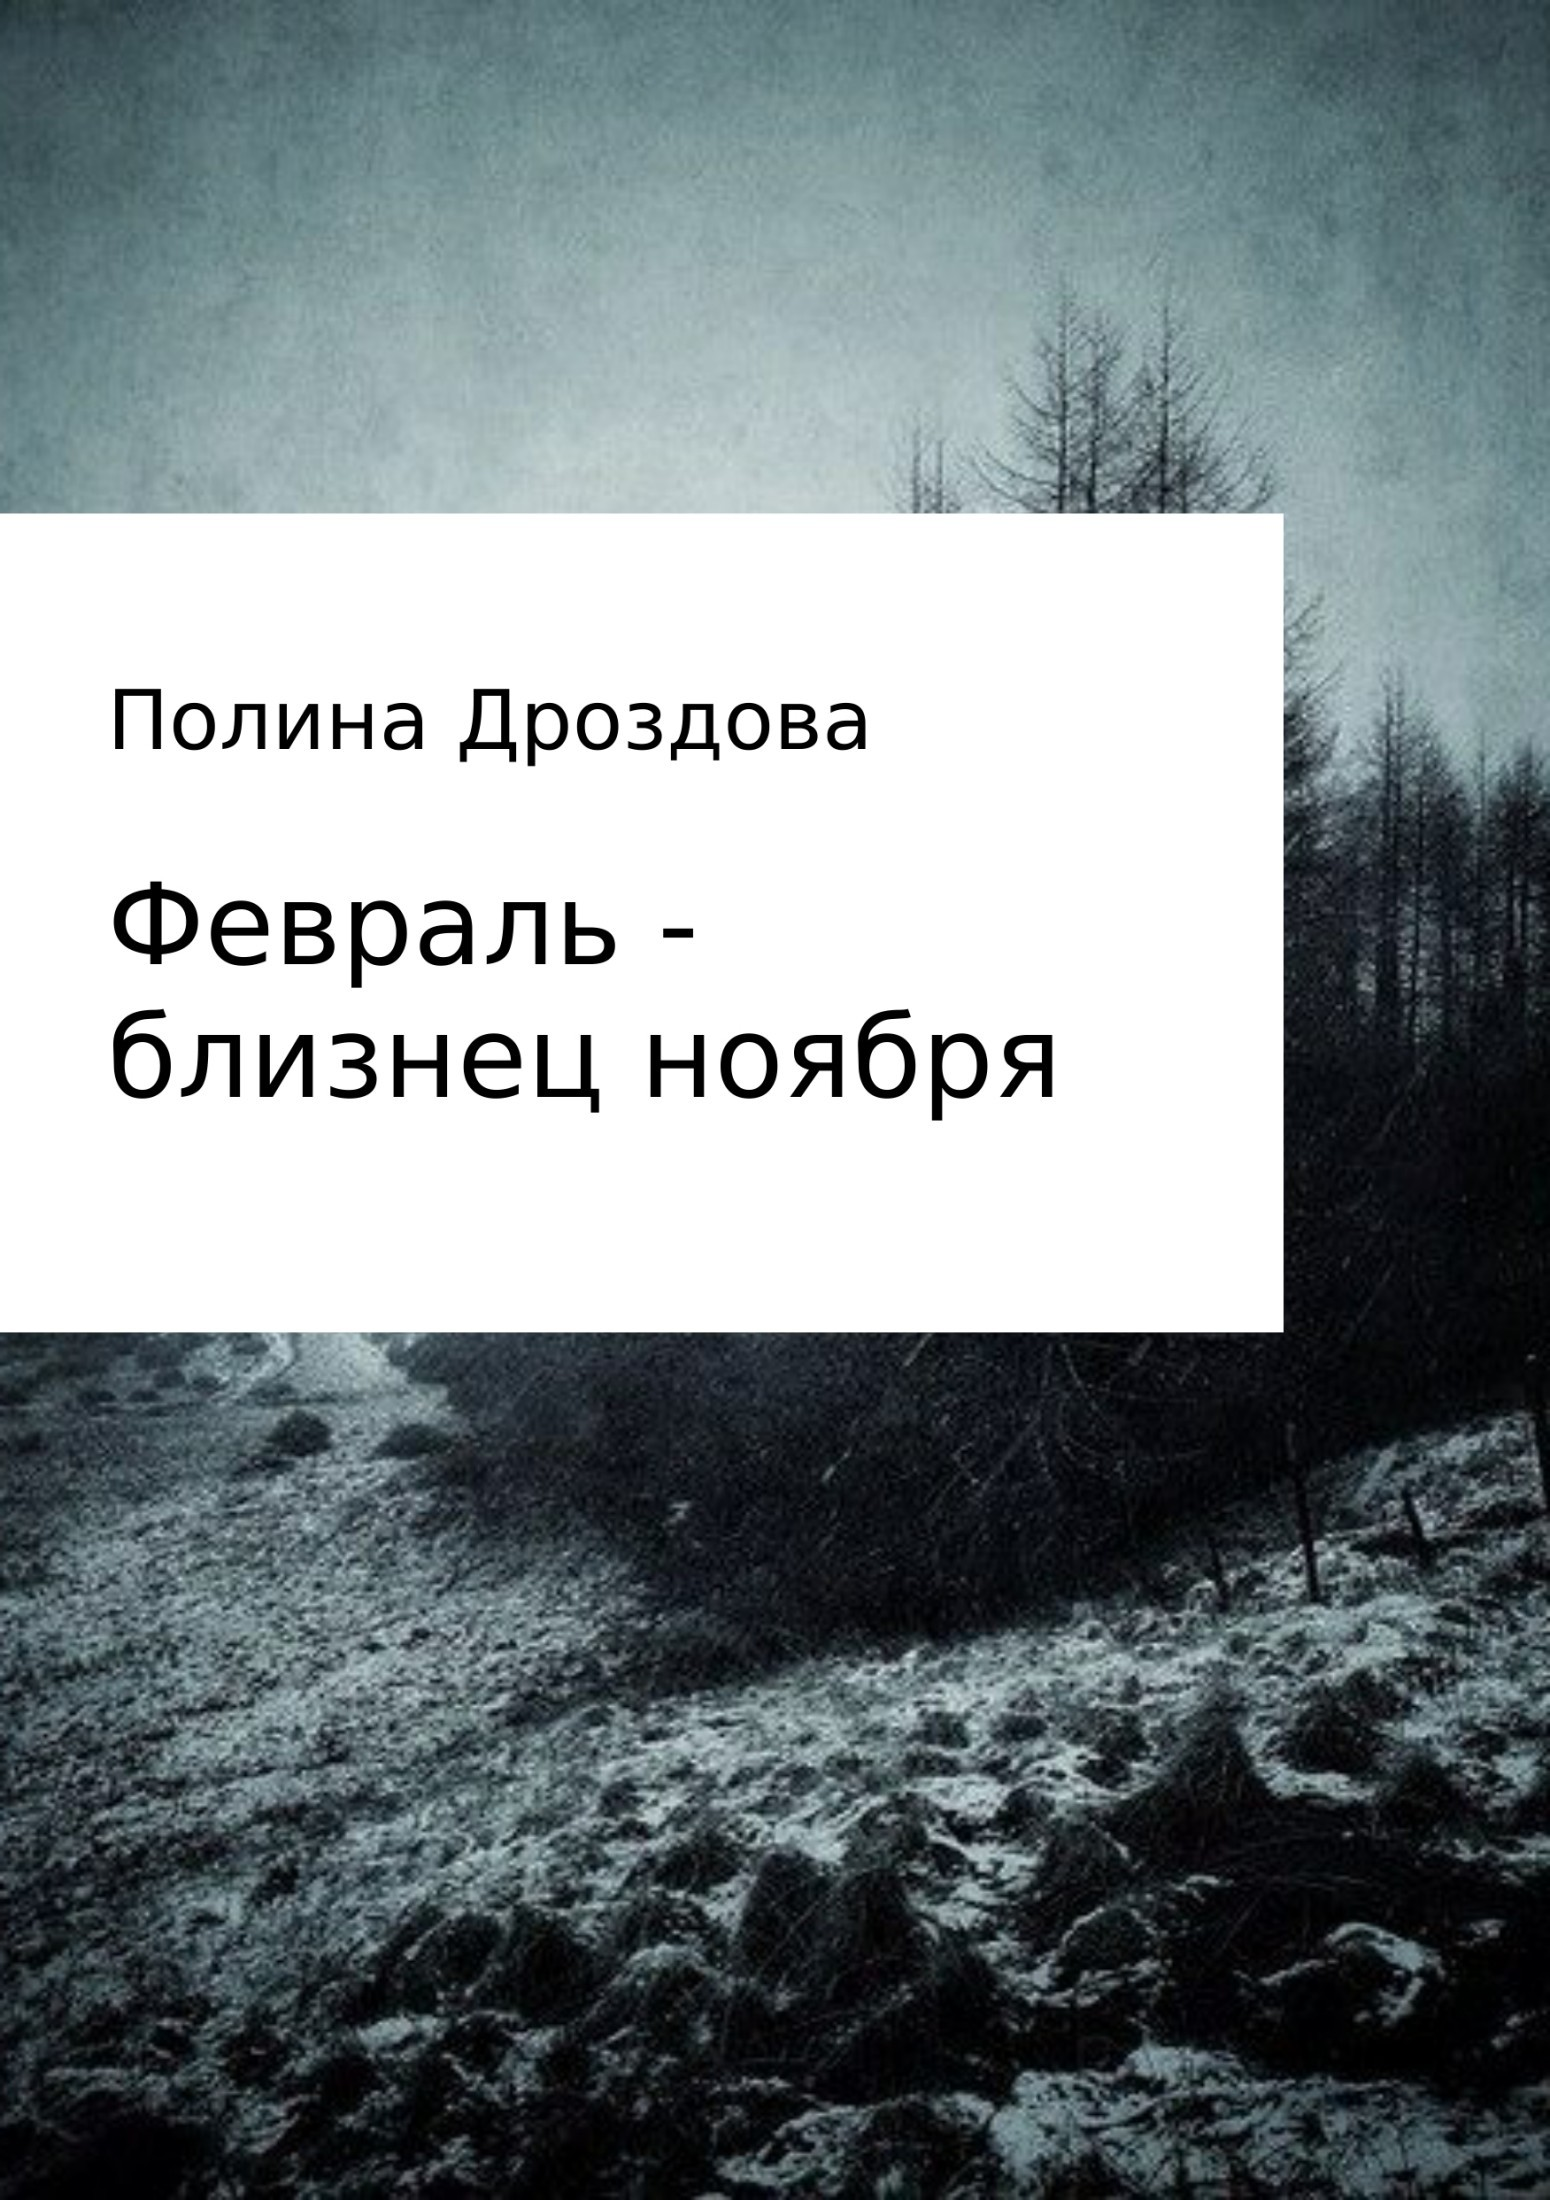 Полина Викторовна Дроздова. Февраль – близнец ноября